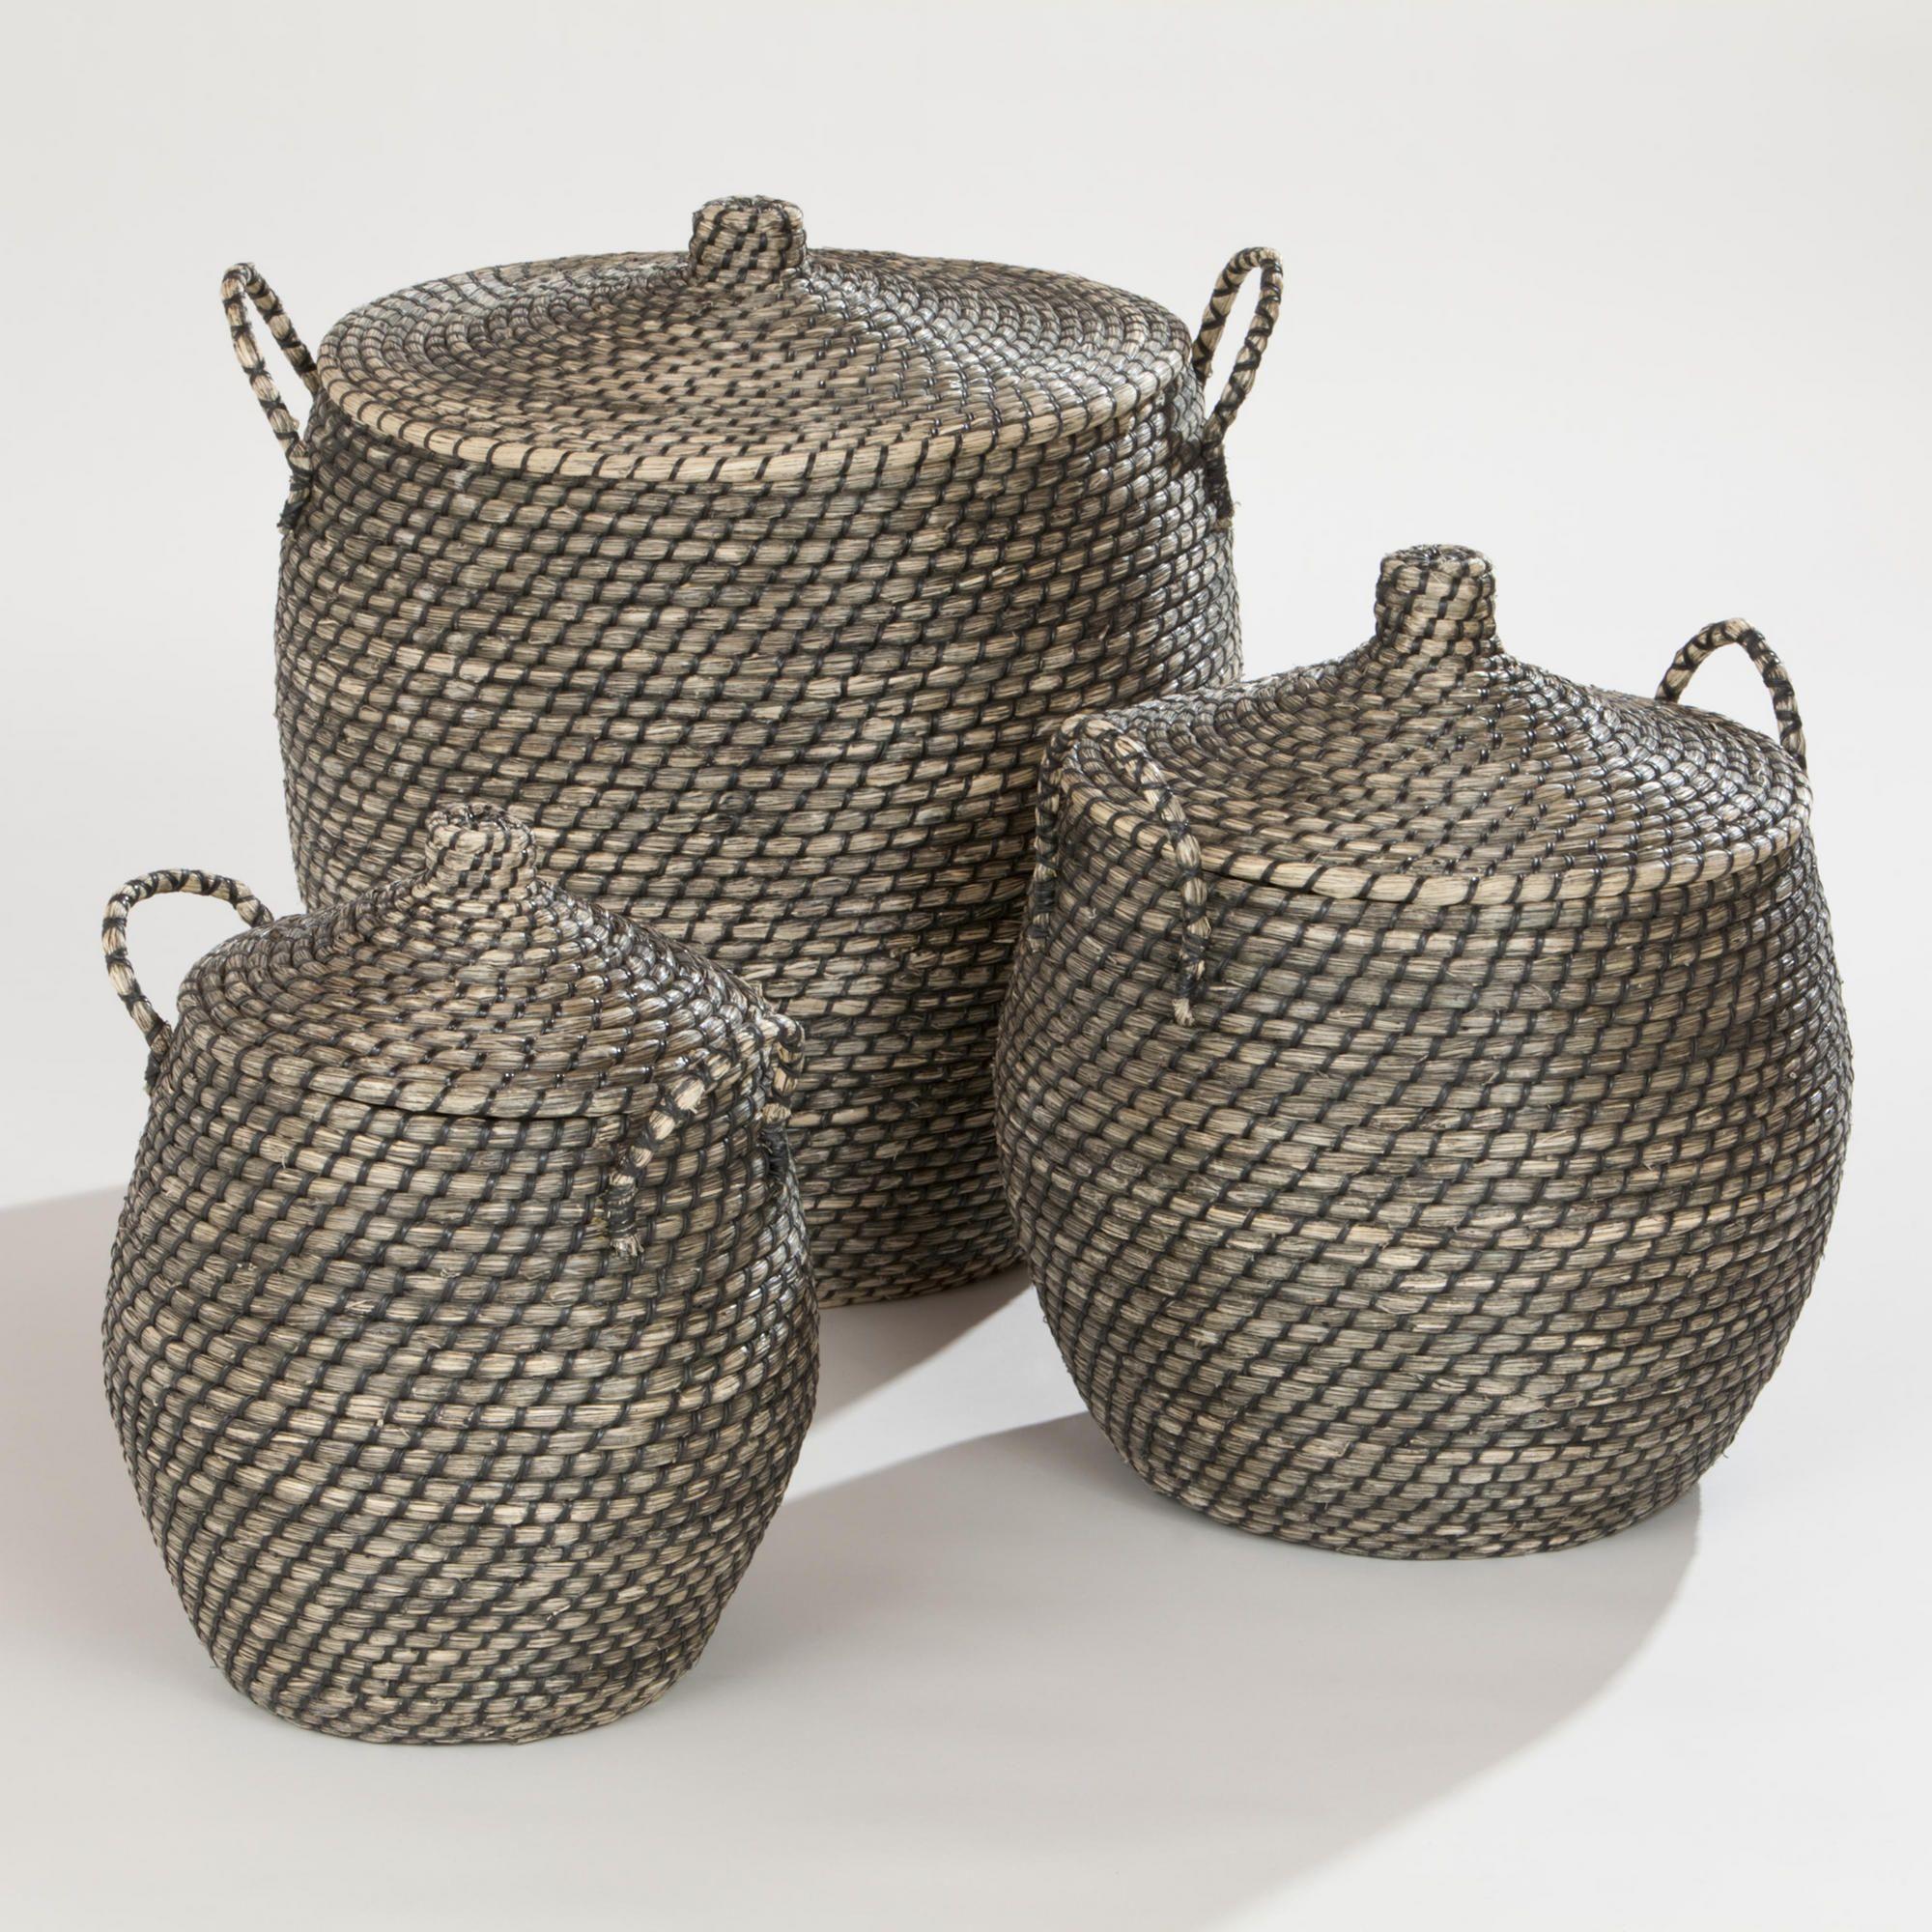 Jamilia Lidded Storage Basket Collection-Jamilia Lidded Storage Basket Collection | World Market